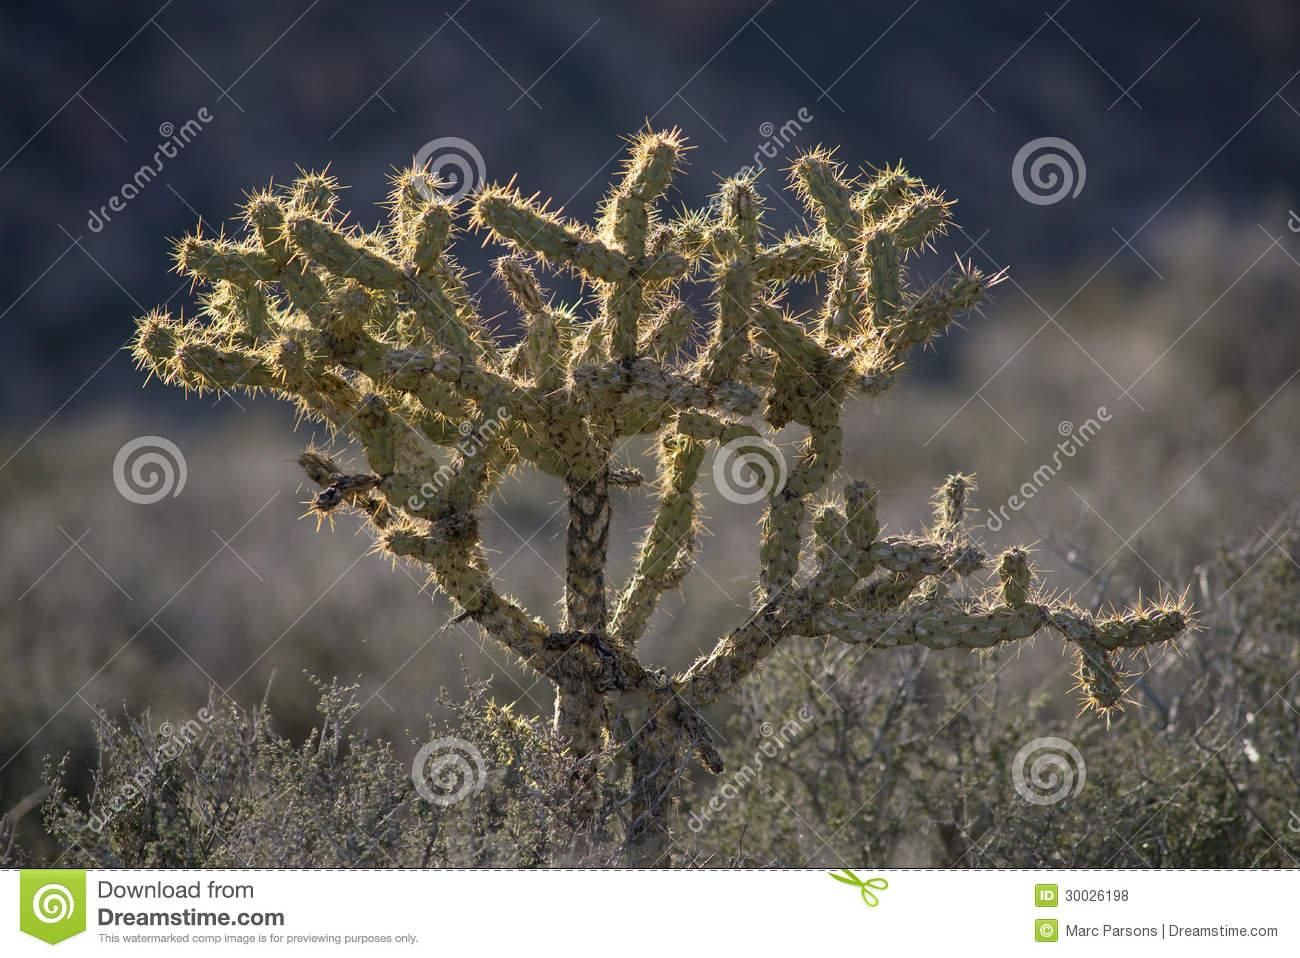 Mojave Desert clipart #6, Download drawings